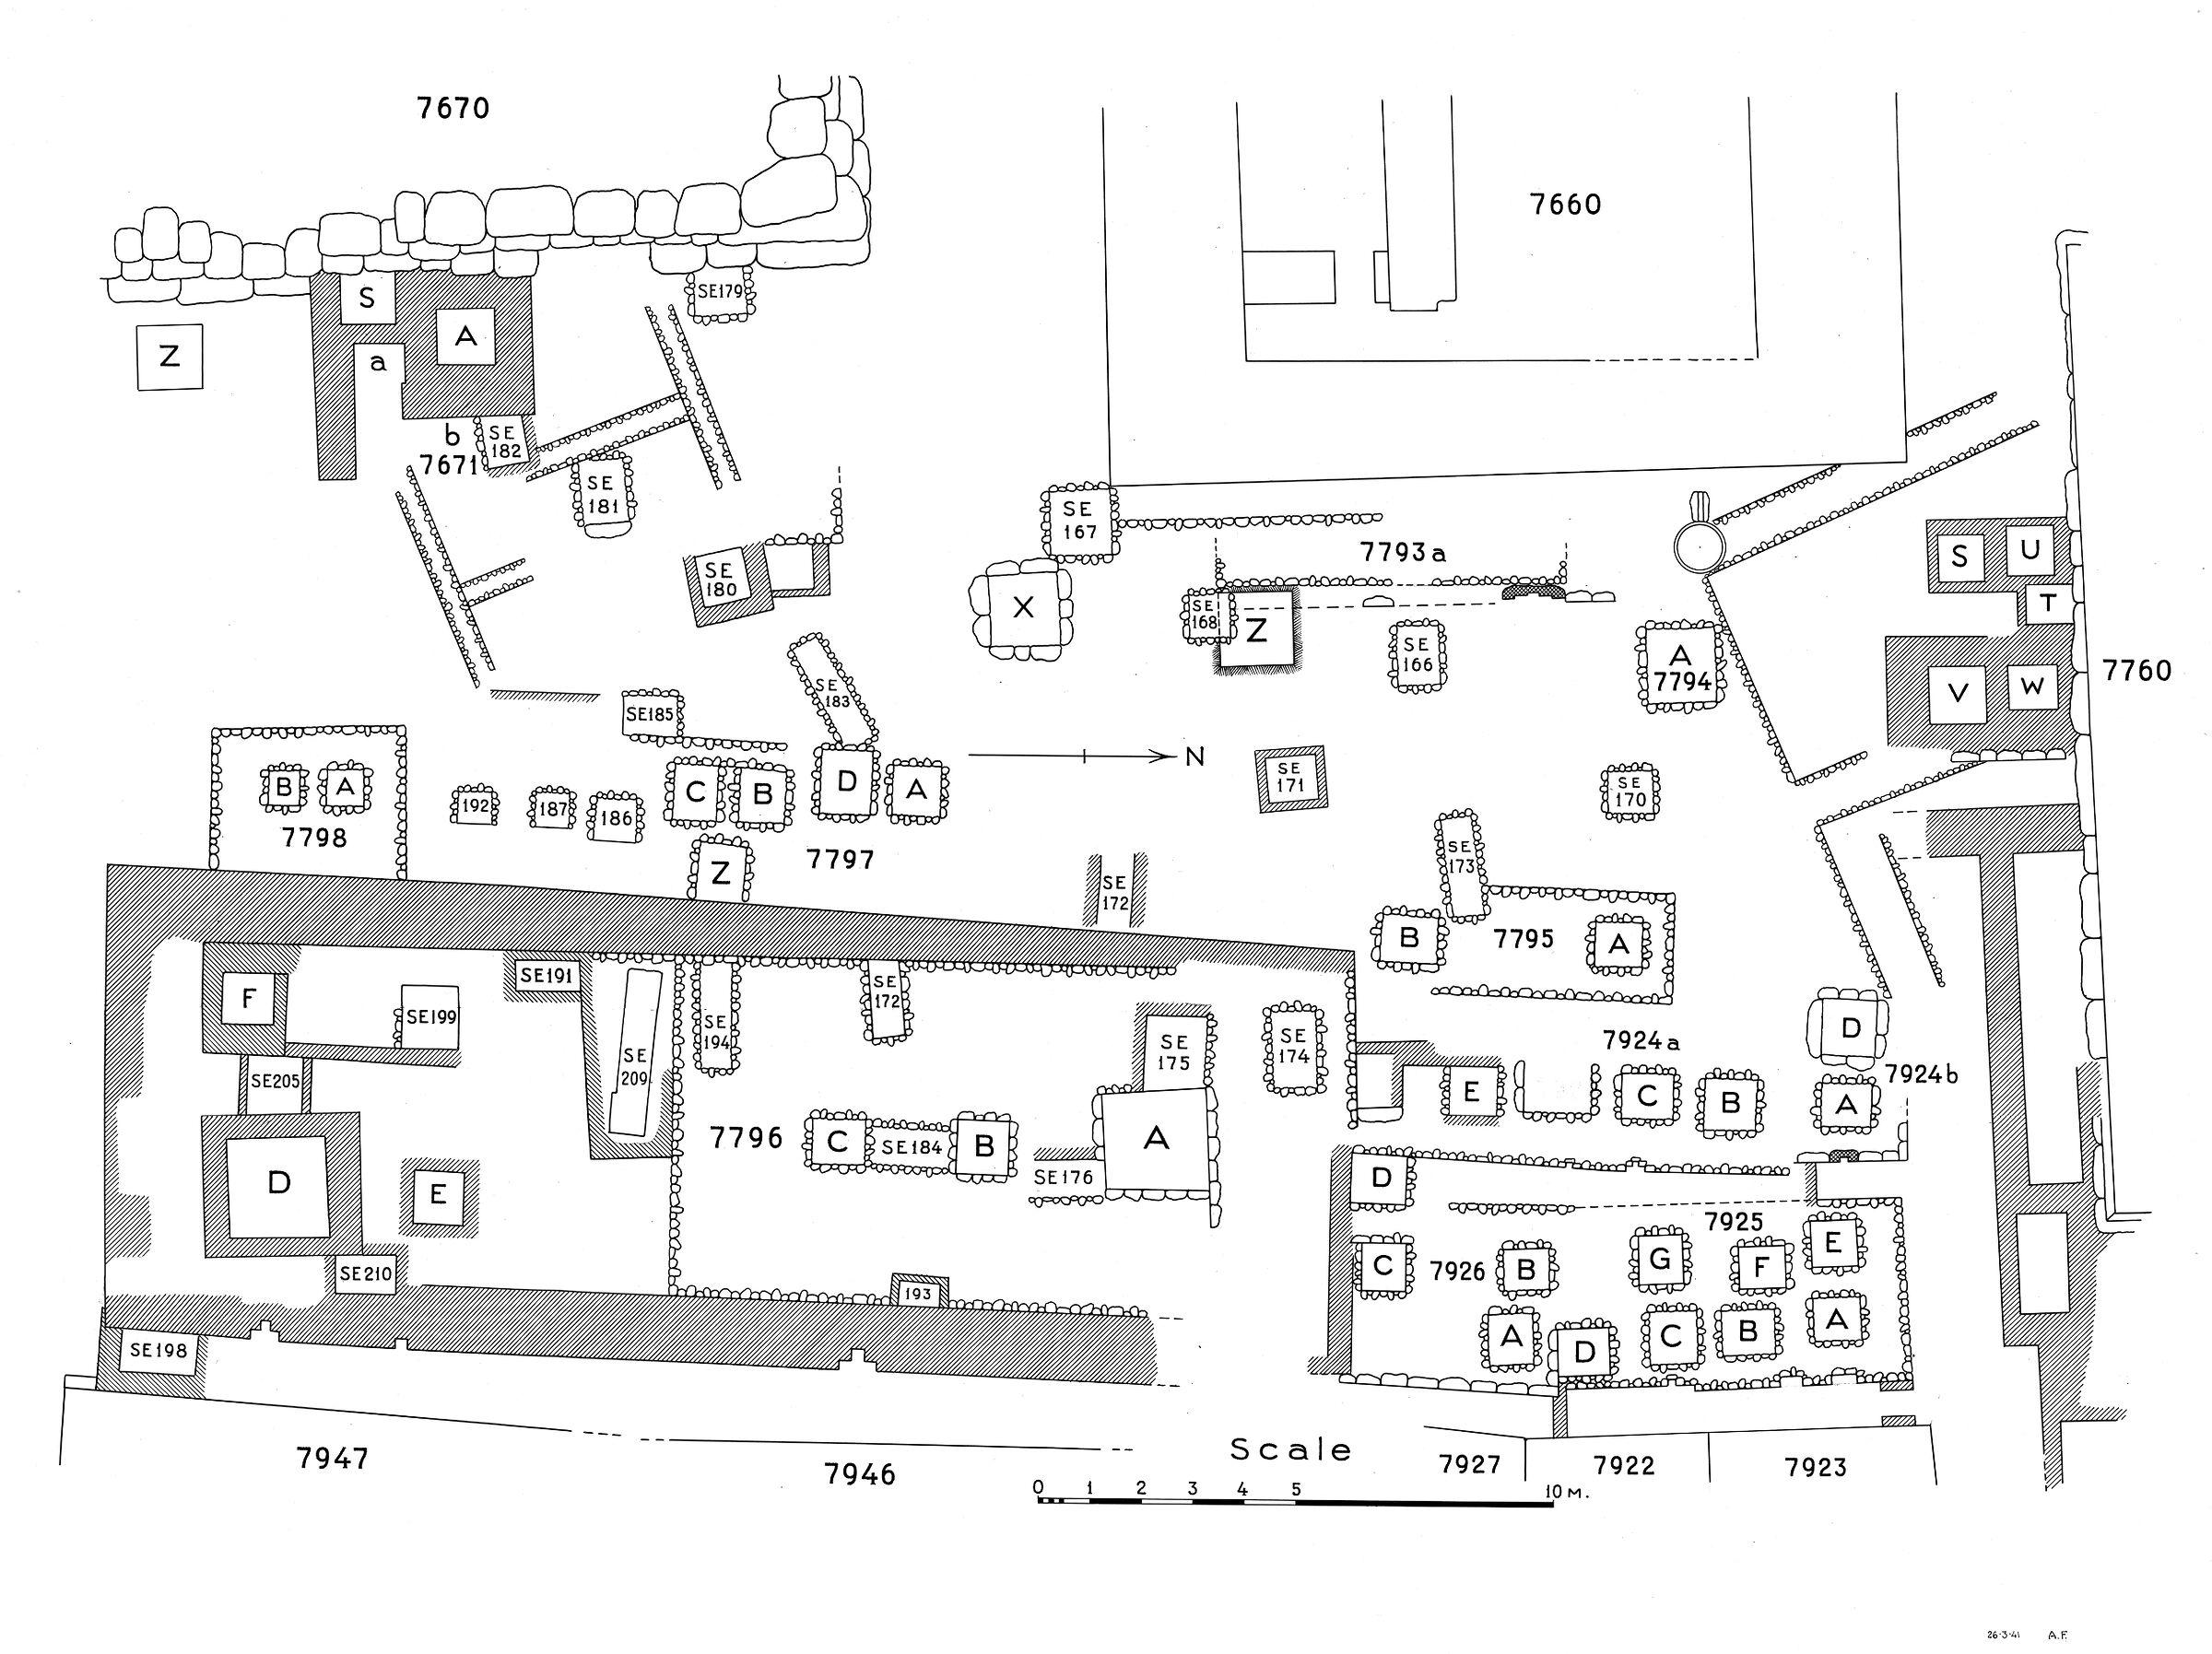 Maps and plans: Plan of cemetery G 7000: G 7600s, G 7700s, G 7900s (1 of 2)